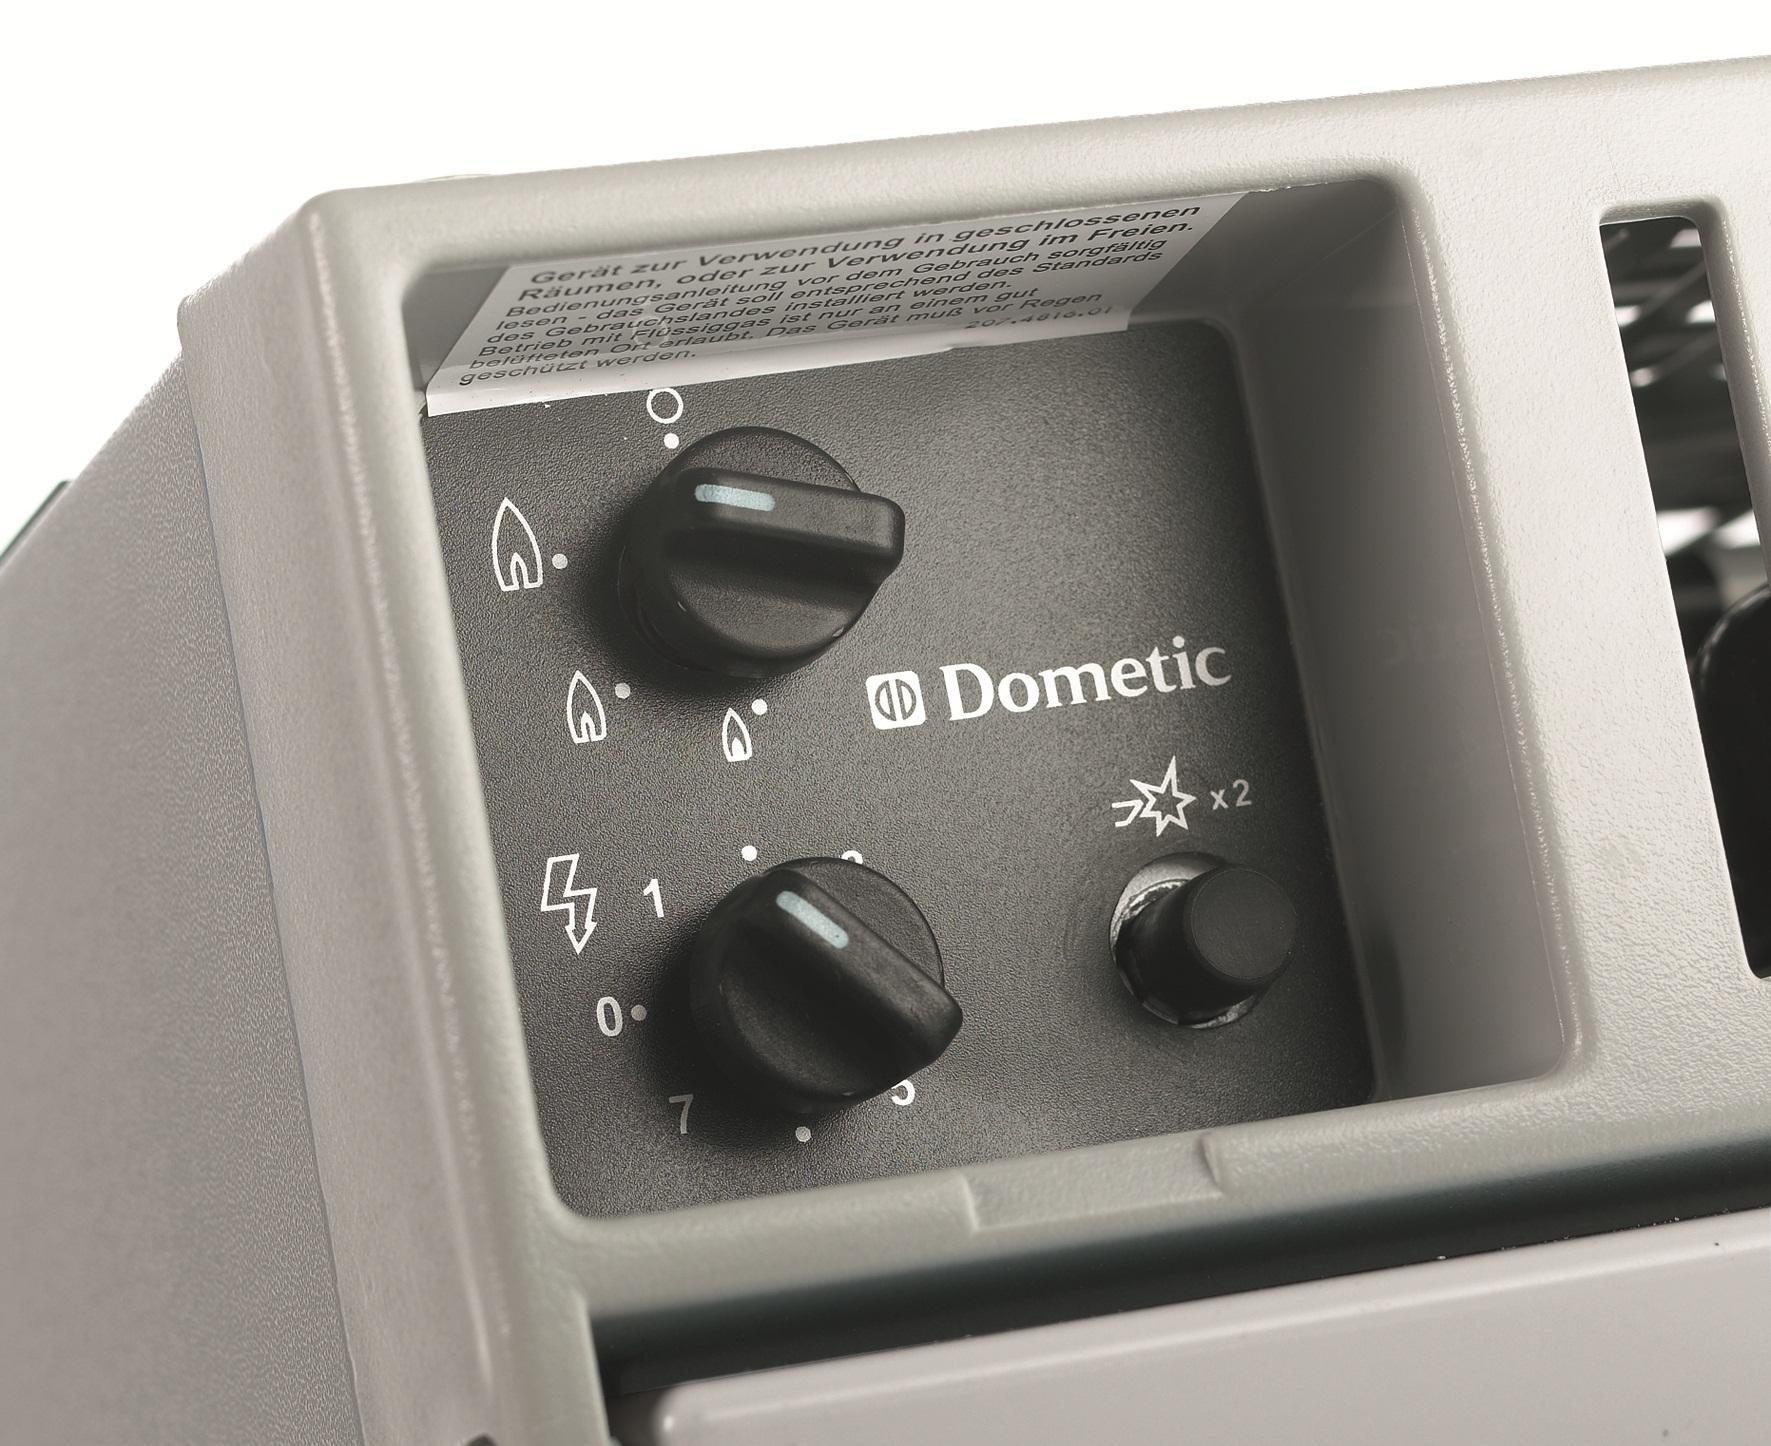 Dometic COMBICOOL RC 1200 EGP - lautlose Absorber-Kühlbox für Auto ...